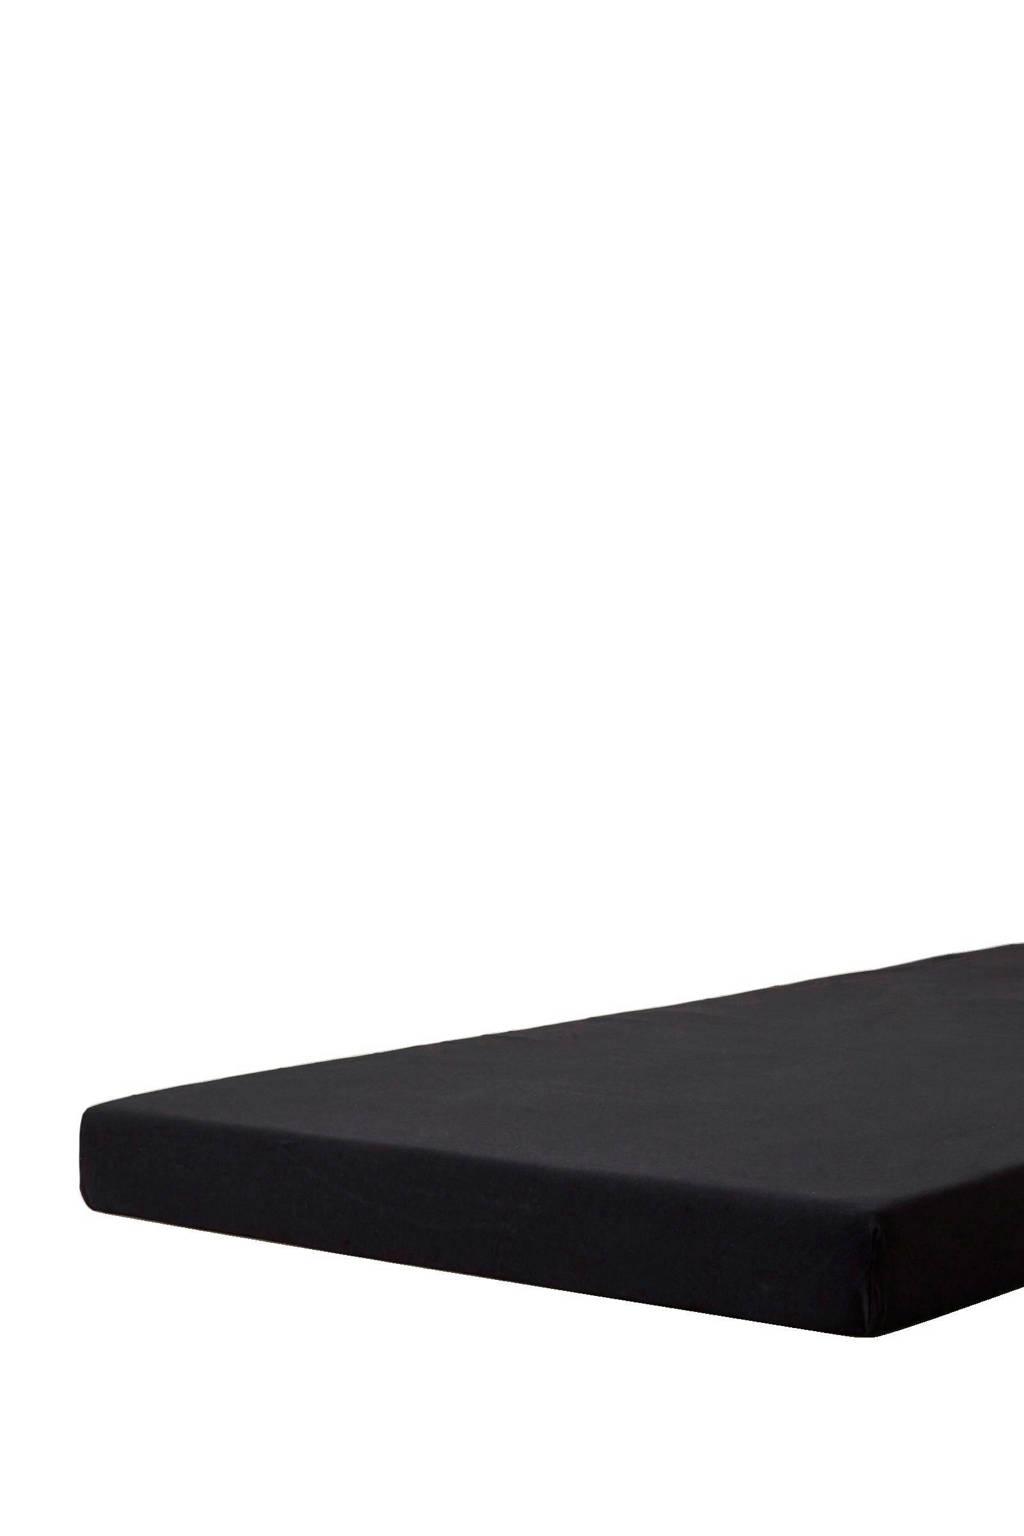 Beddinghouse jersey topmatras hoeslaken Zwart